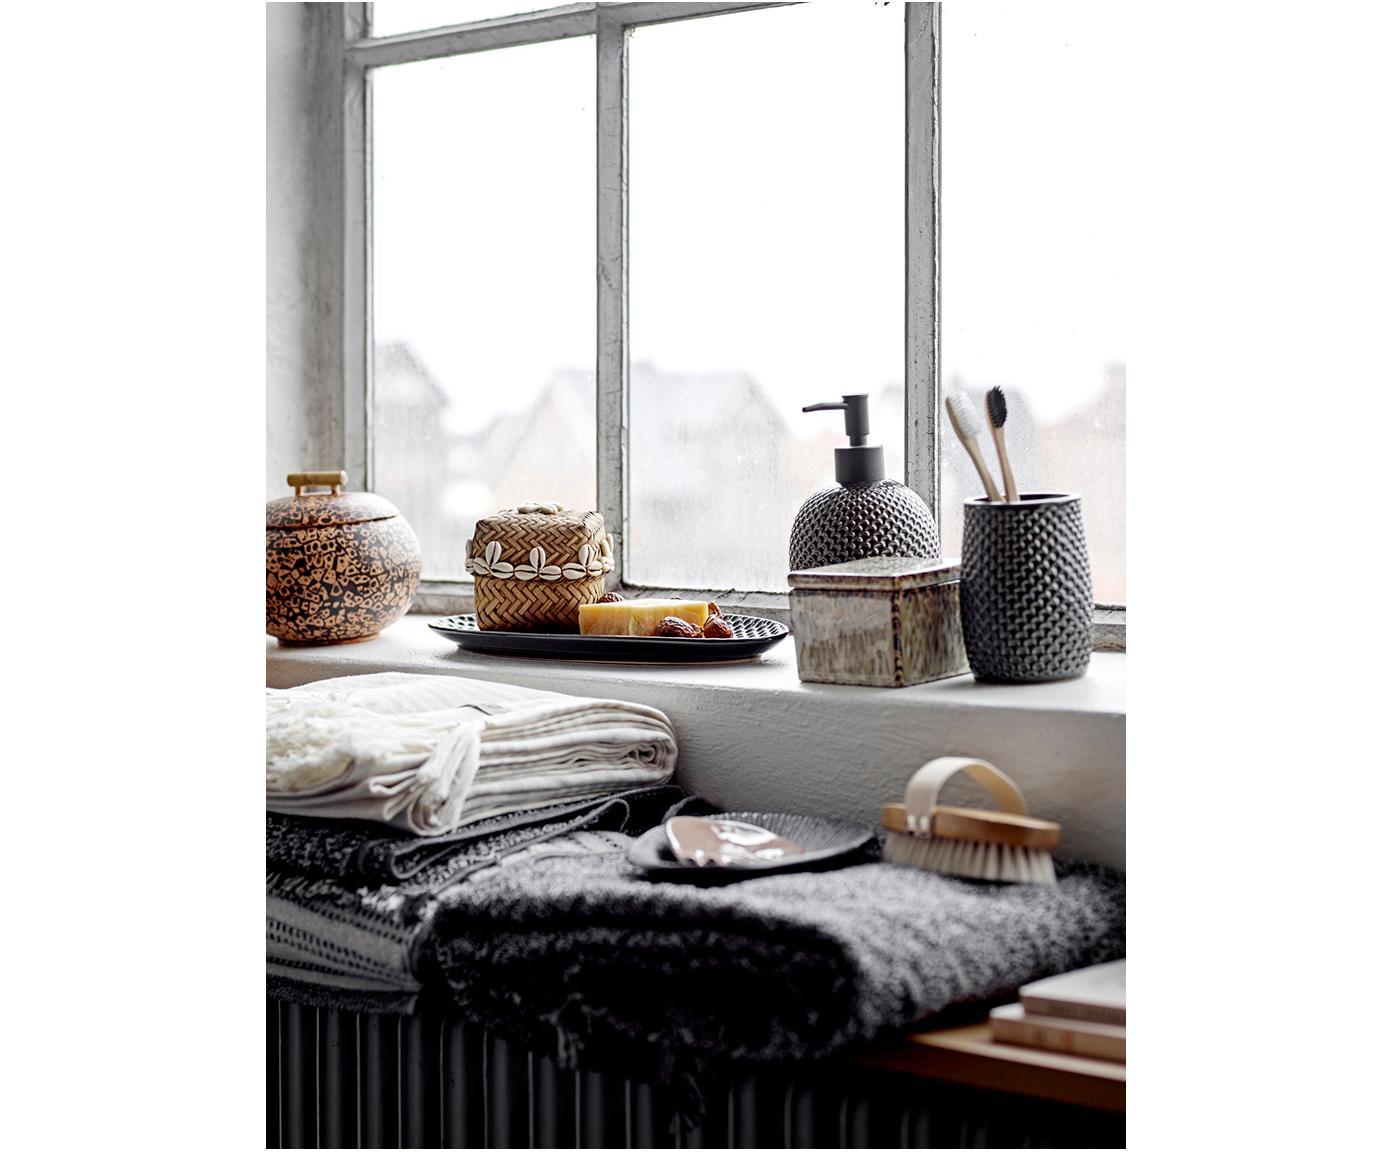 Set de baño artesanal Gustav, Gres, polipropileno, Antracita, Tamaños diferentes